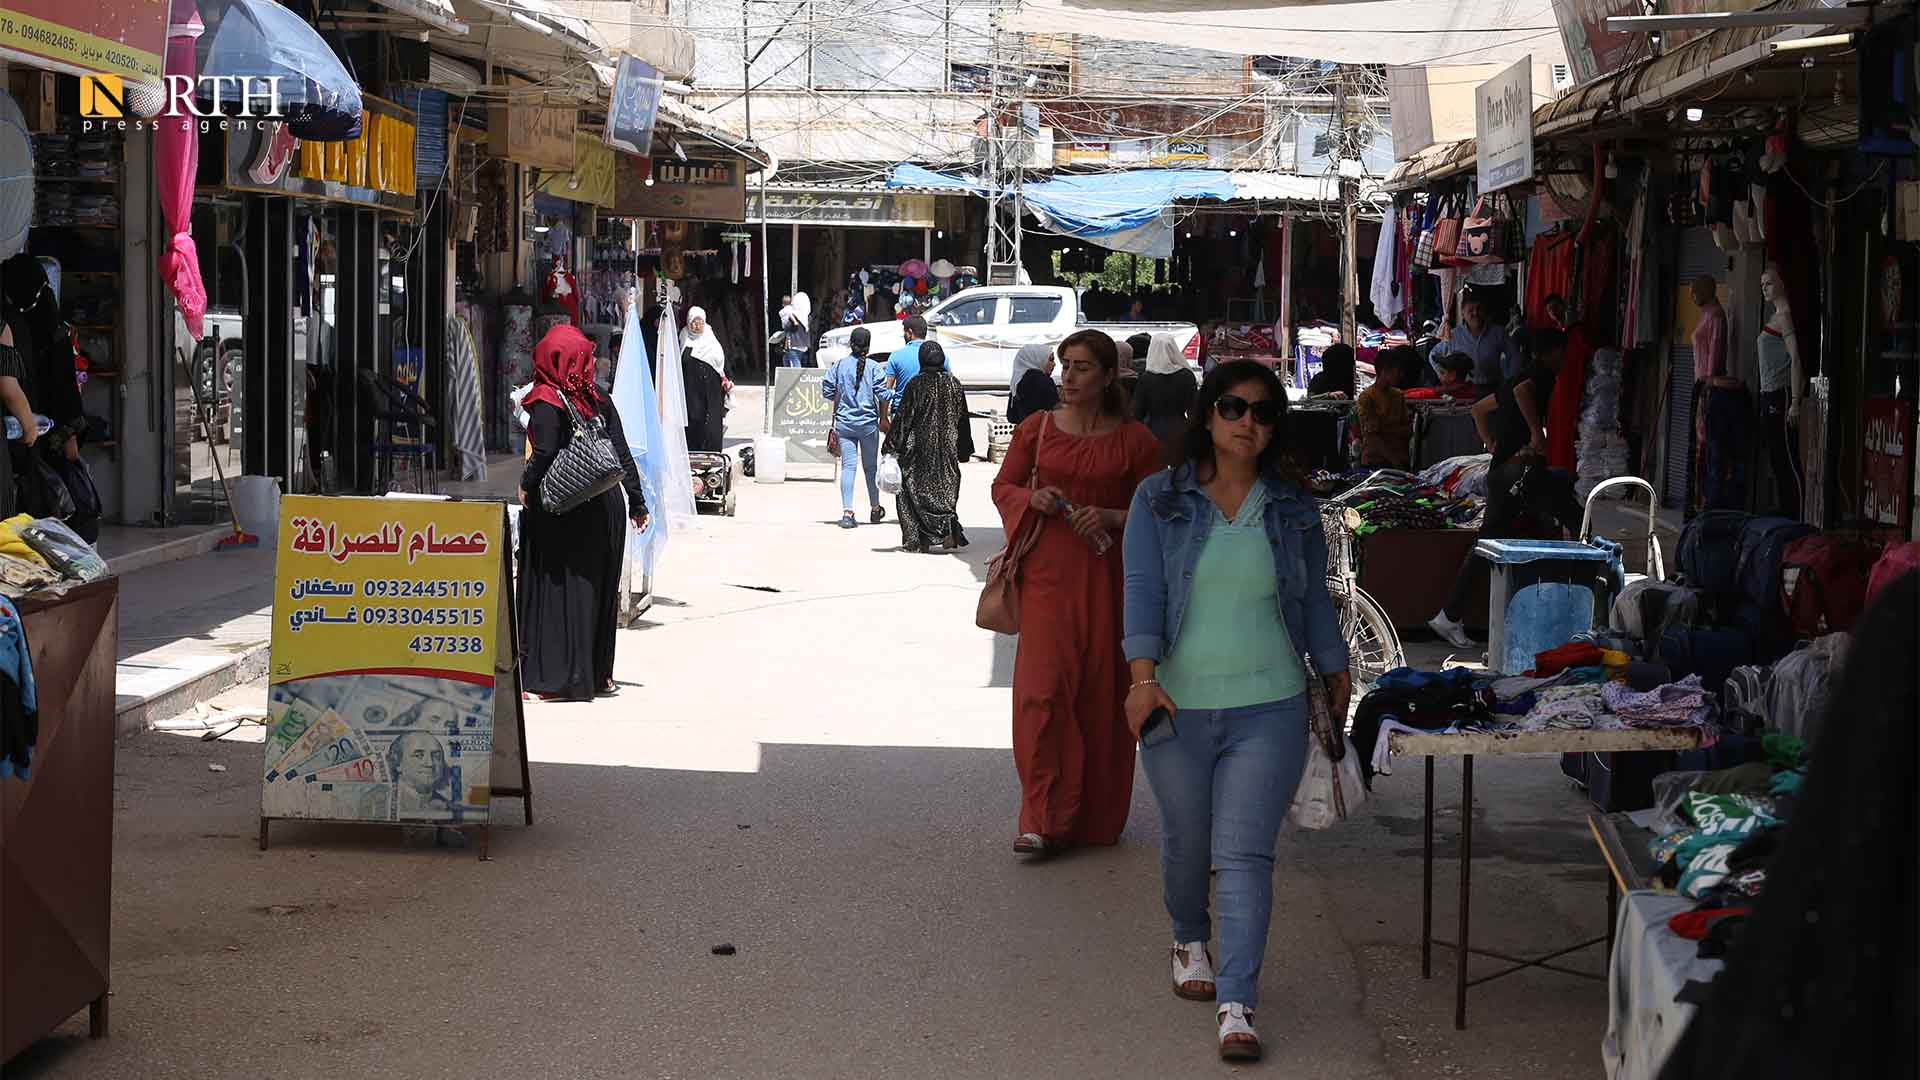 Marketplace of the city of Qamishli – North Press